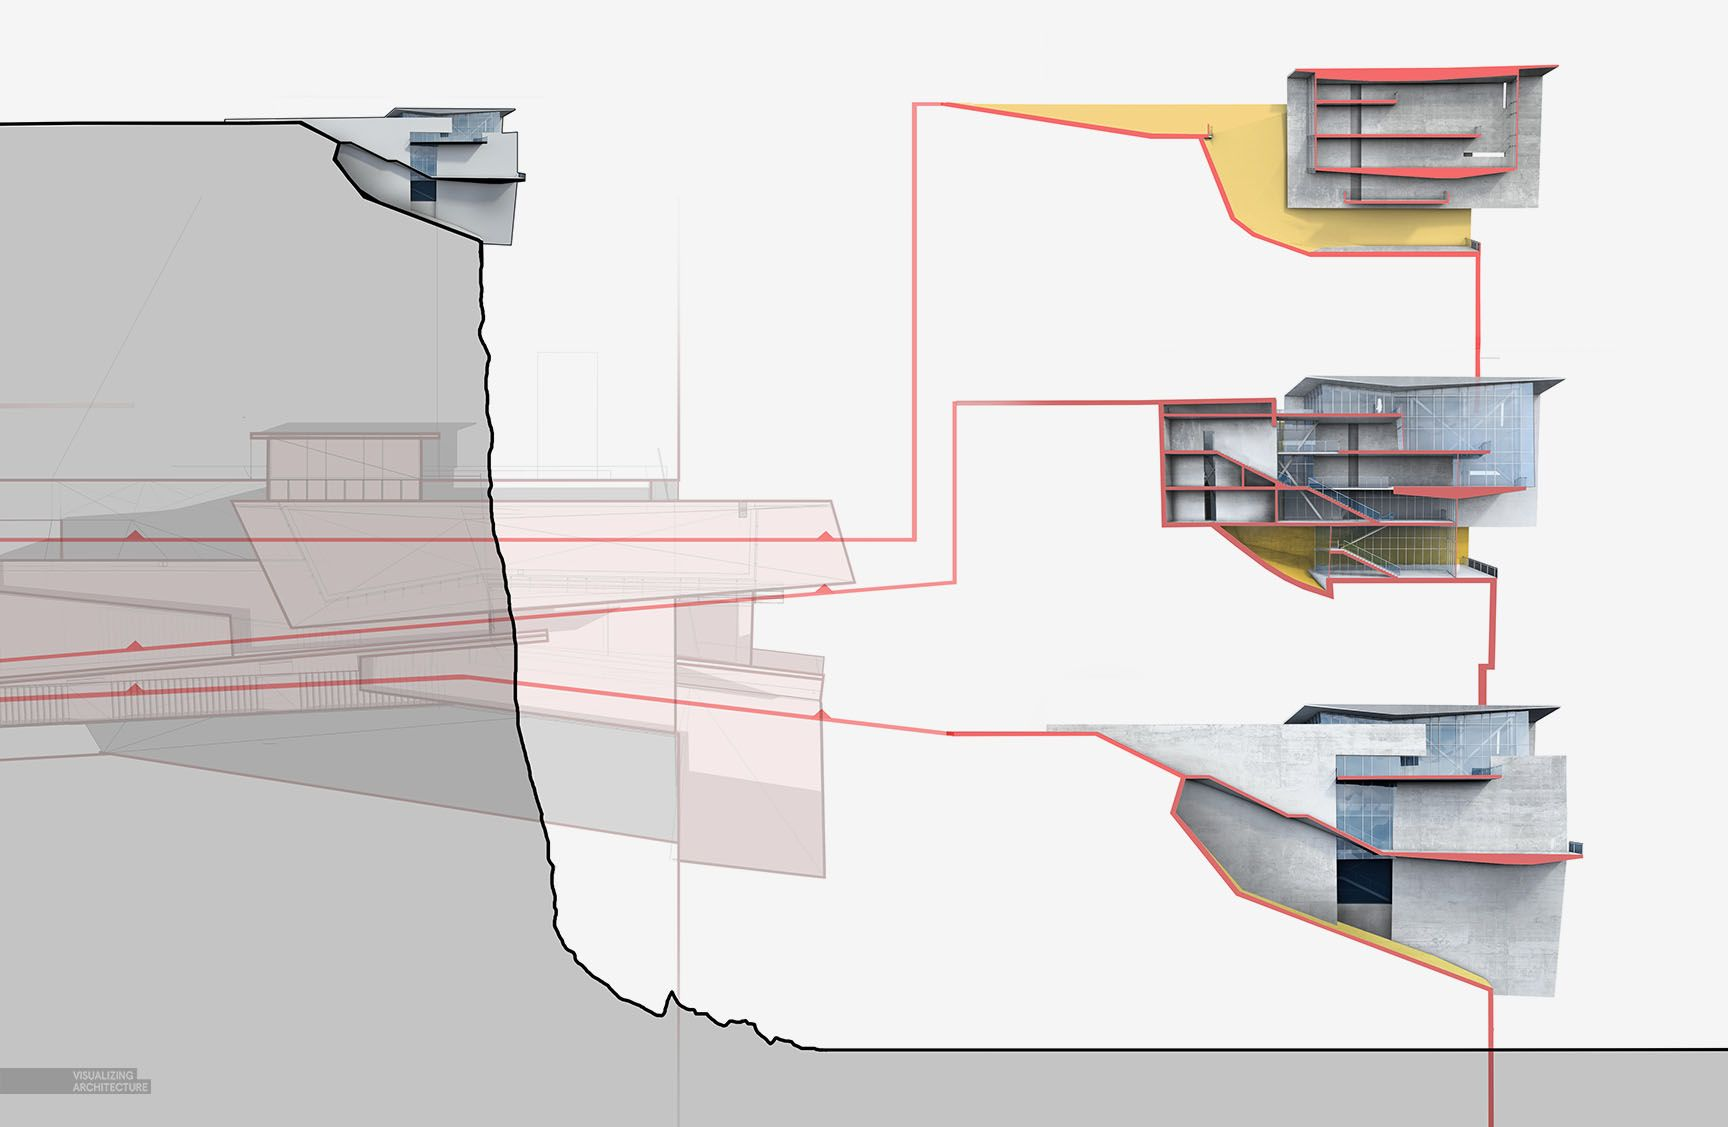 cliff_retreat_Sections_5_Poche_alexhogrefe